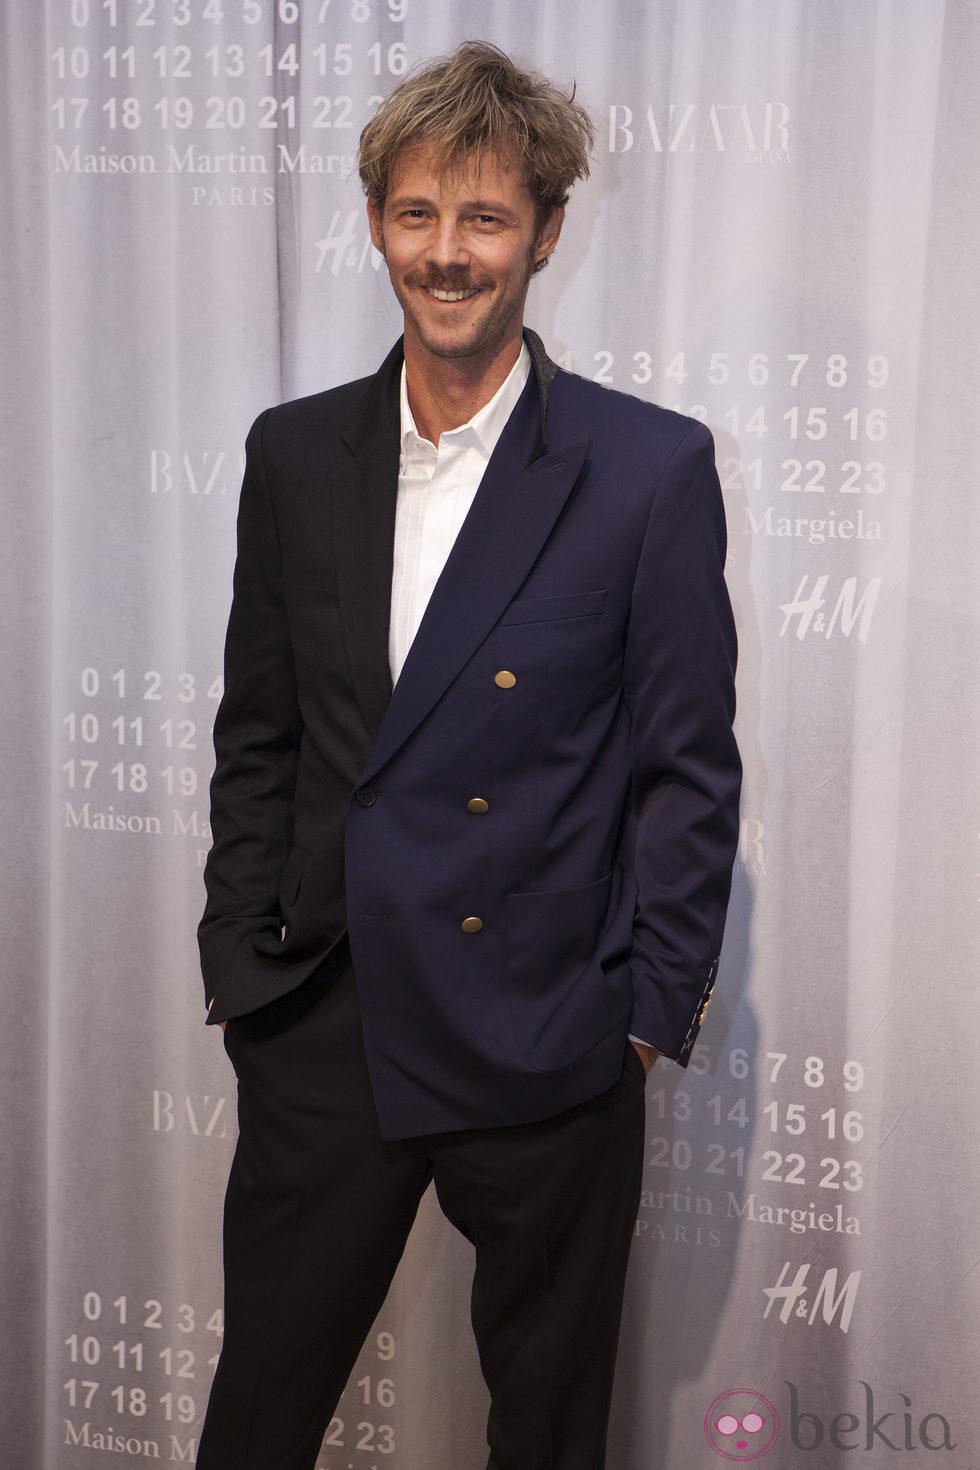 Eloy Azorín en la fiesta de Maison Martin Margiela y H&M